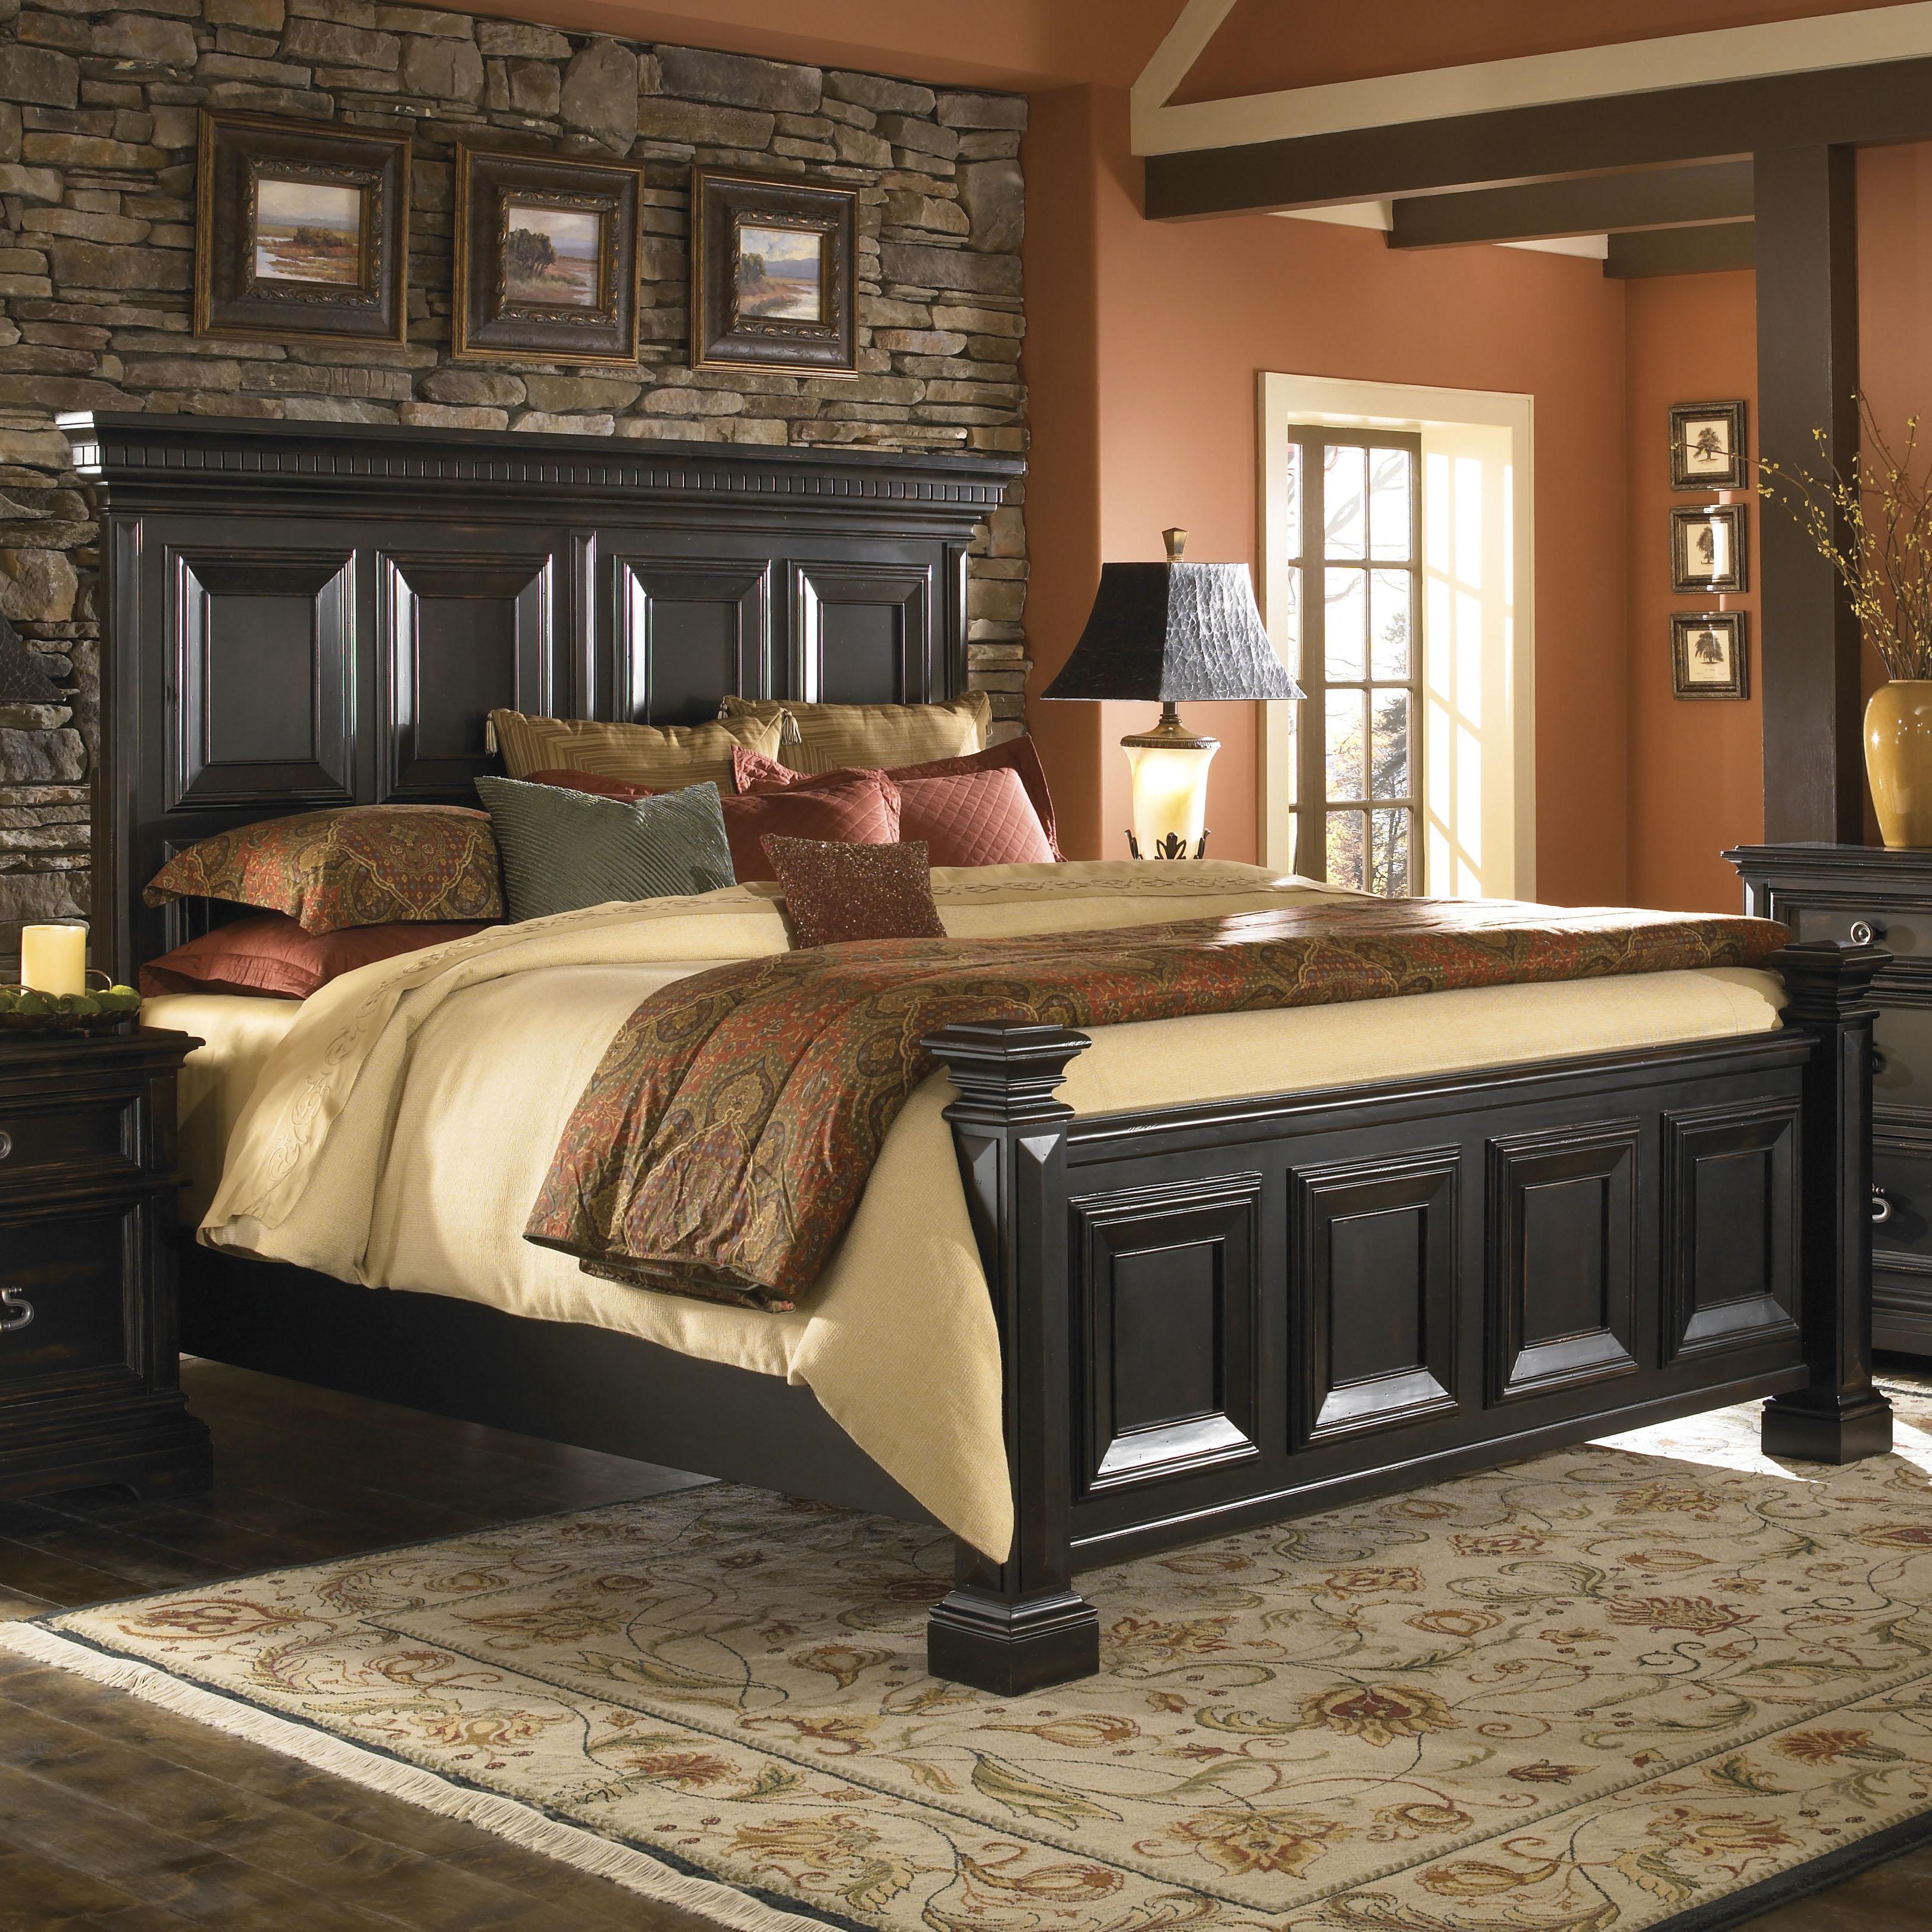 Pulaski furniture brookfield king panel bed darvin for Pulaski furniture